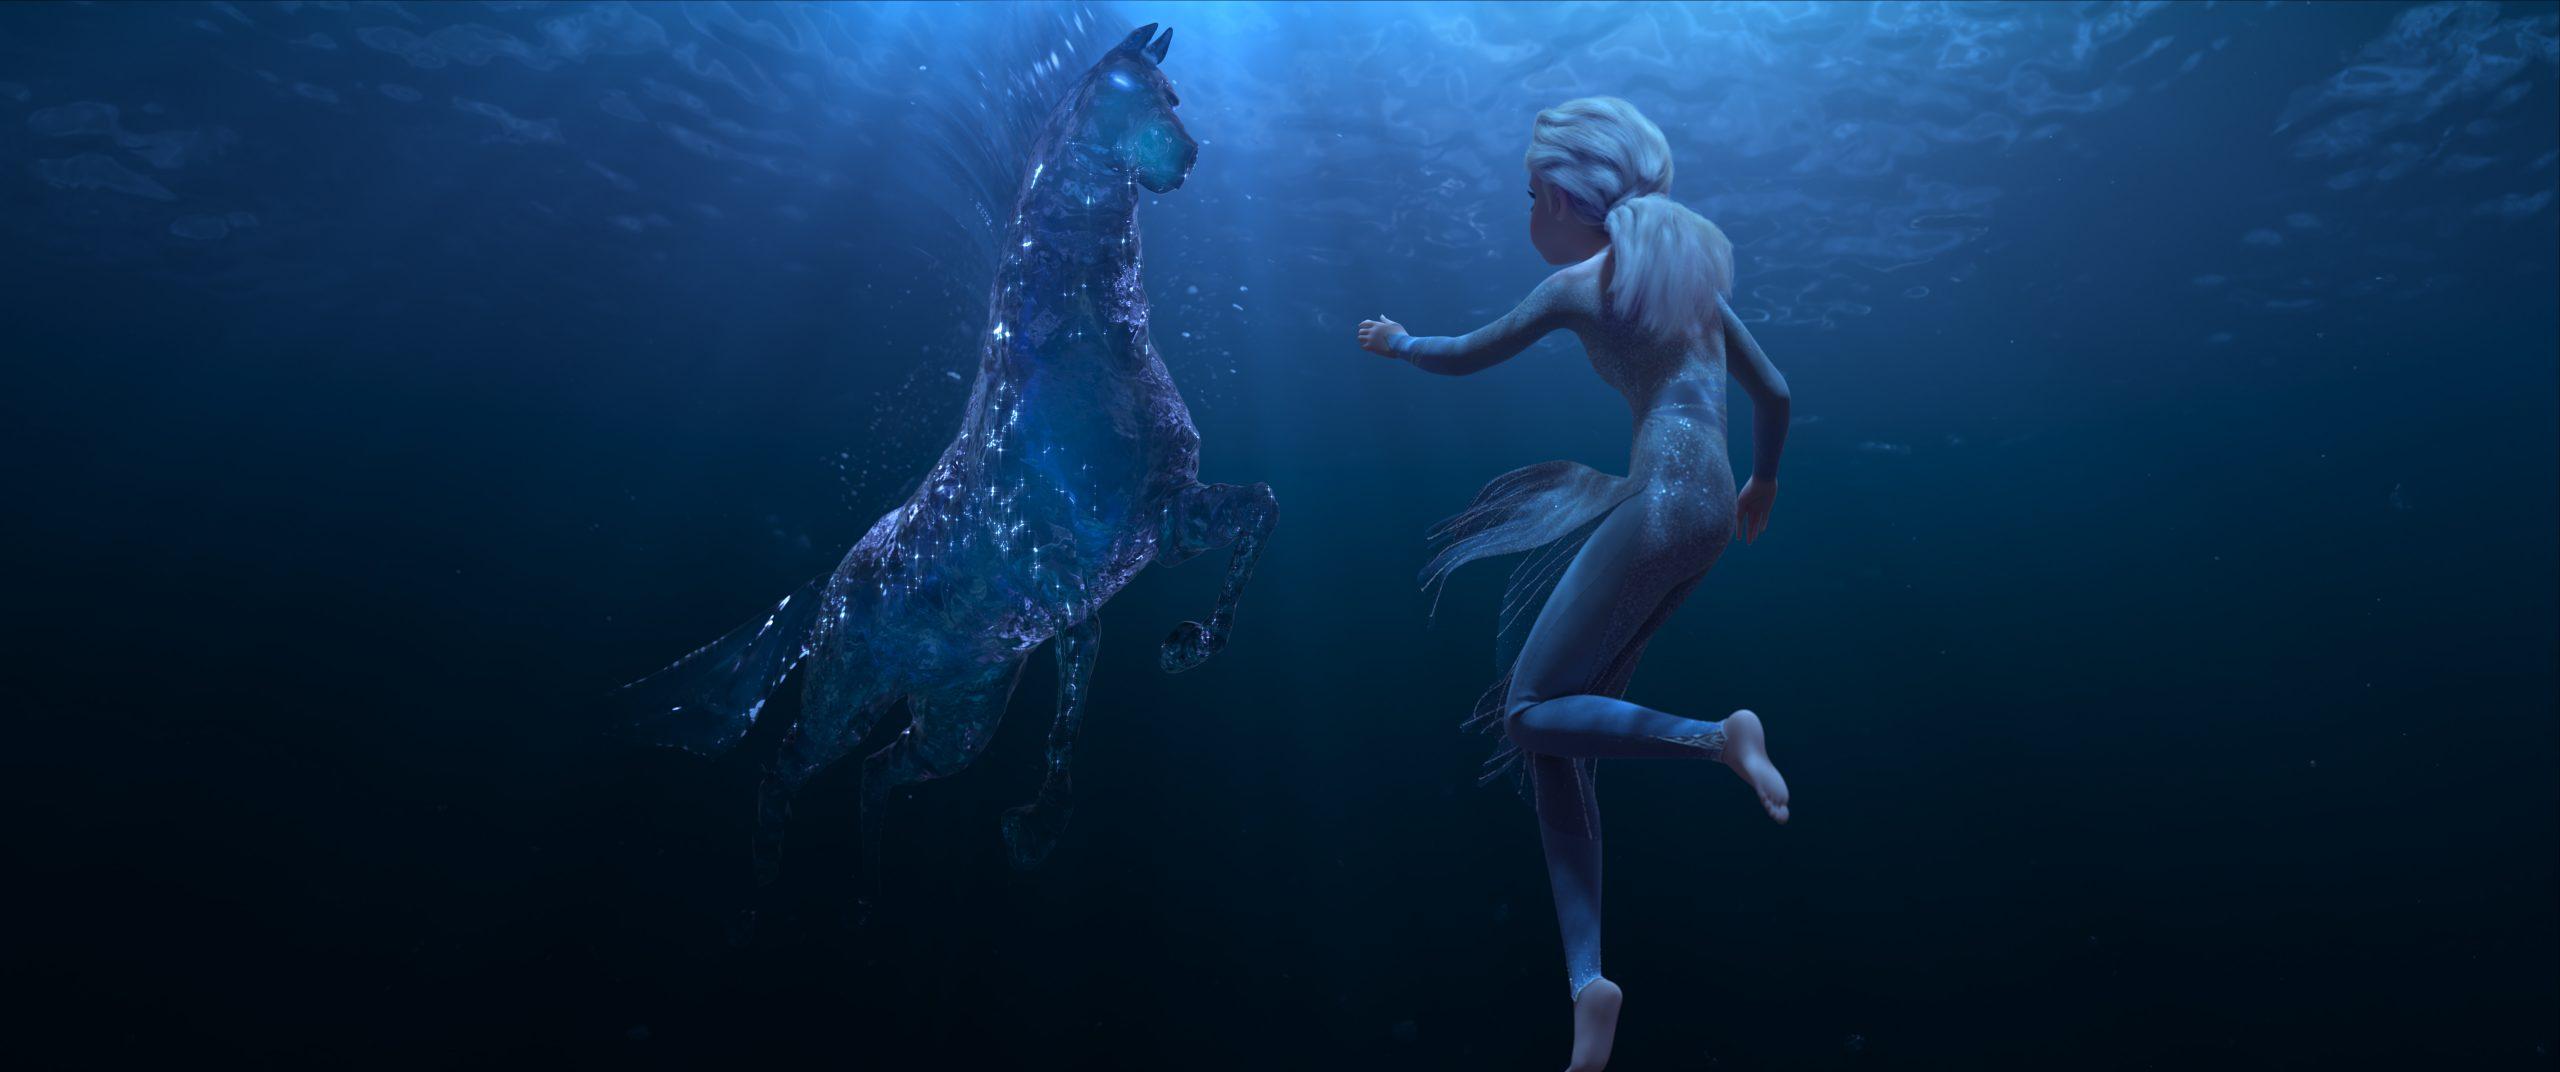 Frozen 2 Secrets: Elsa travels to the Dark Sea!